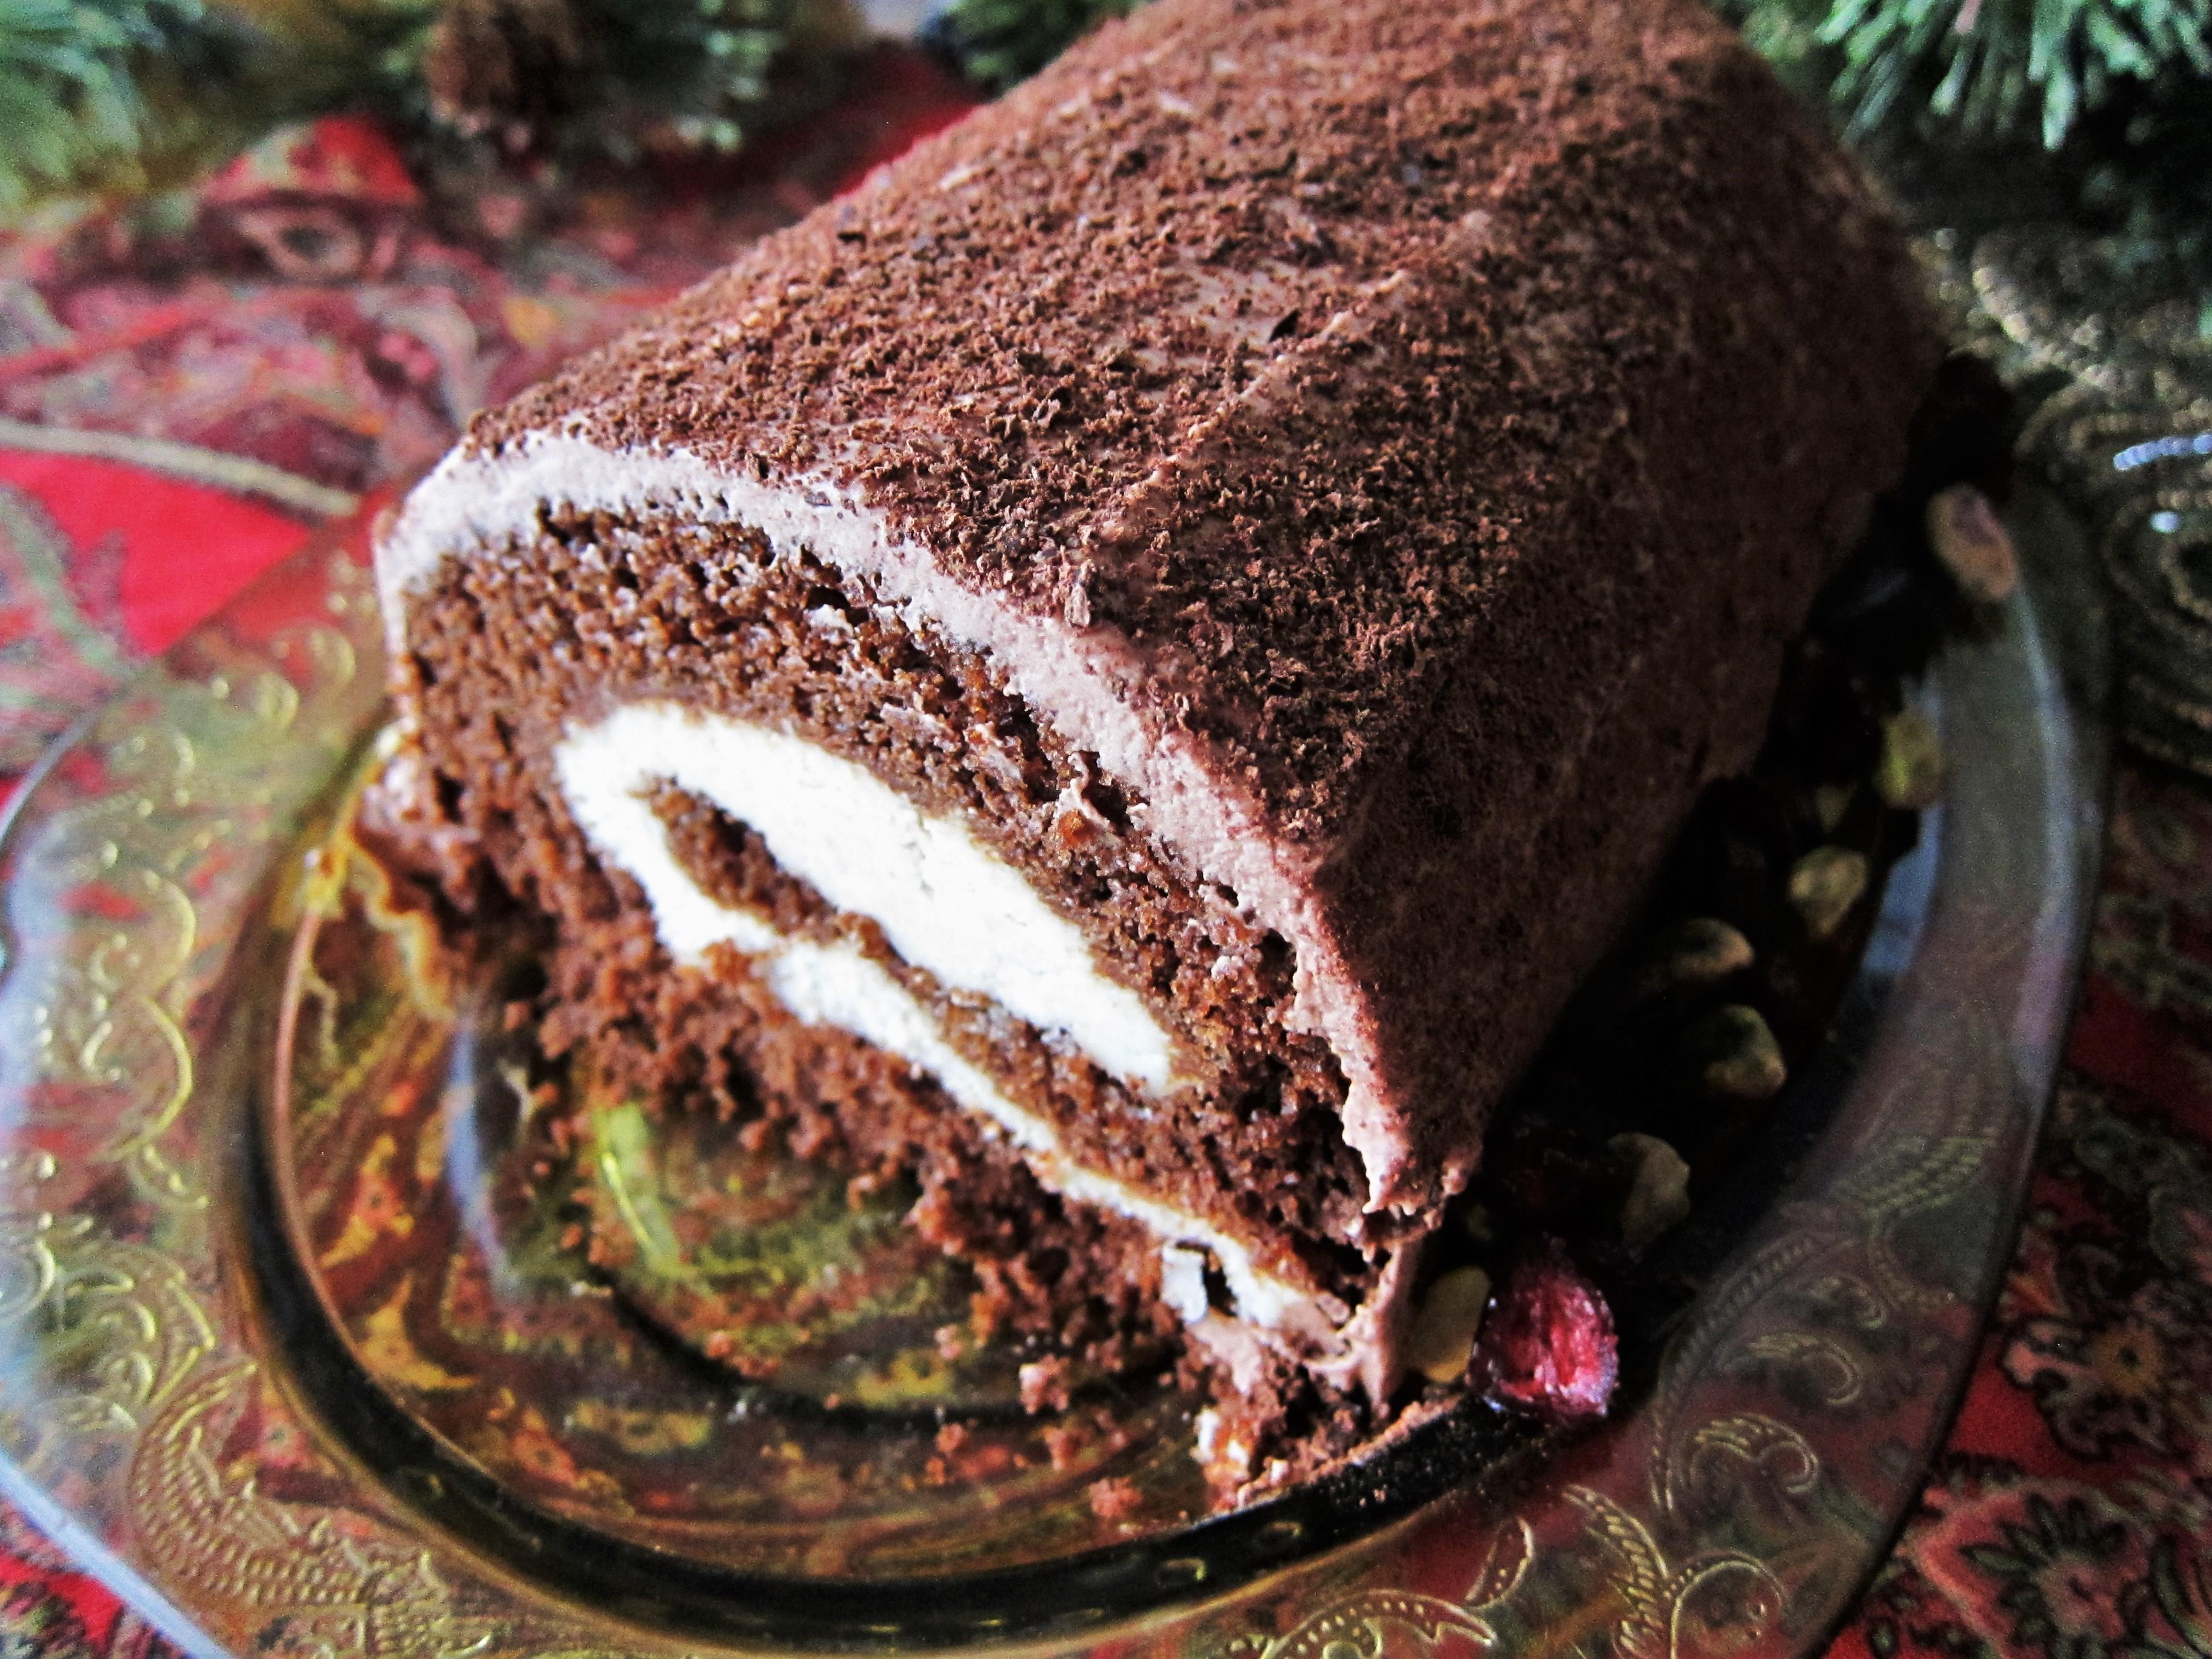 Vegan Yule Log Cake with Chestnut Cream Filling